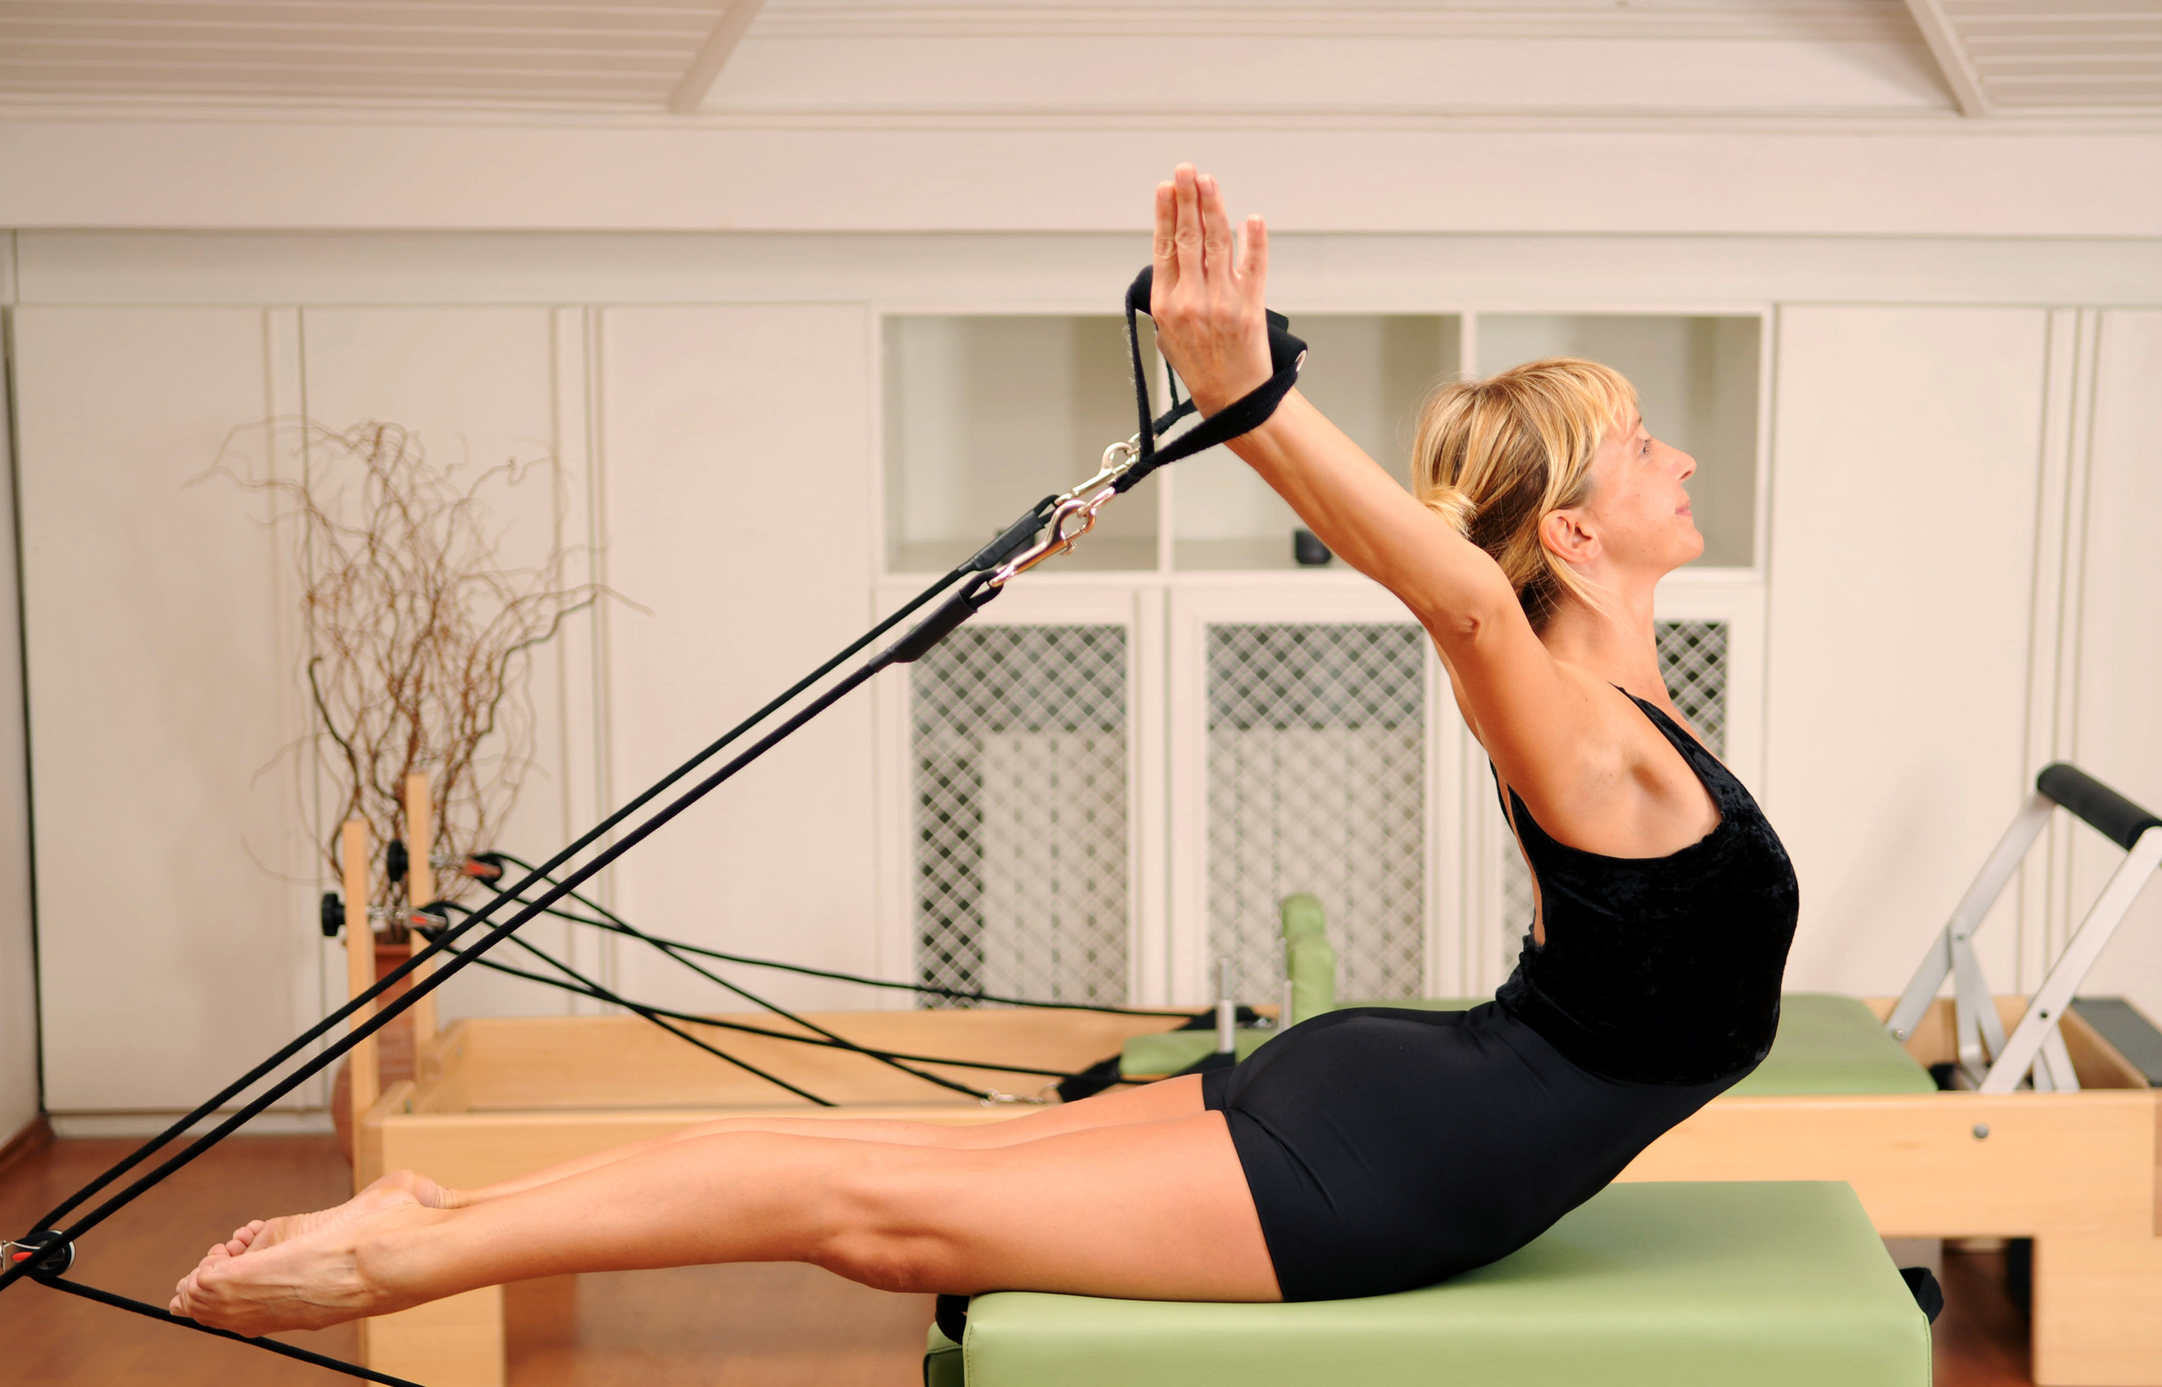 Pilates : origine, principe, bienfaits… | Santé Magazine